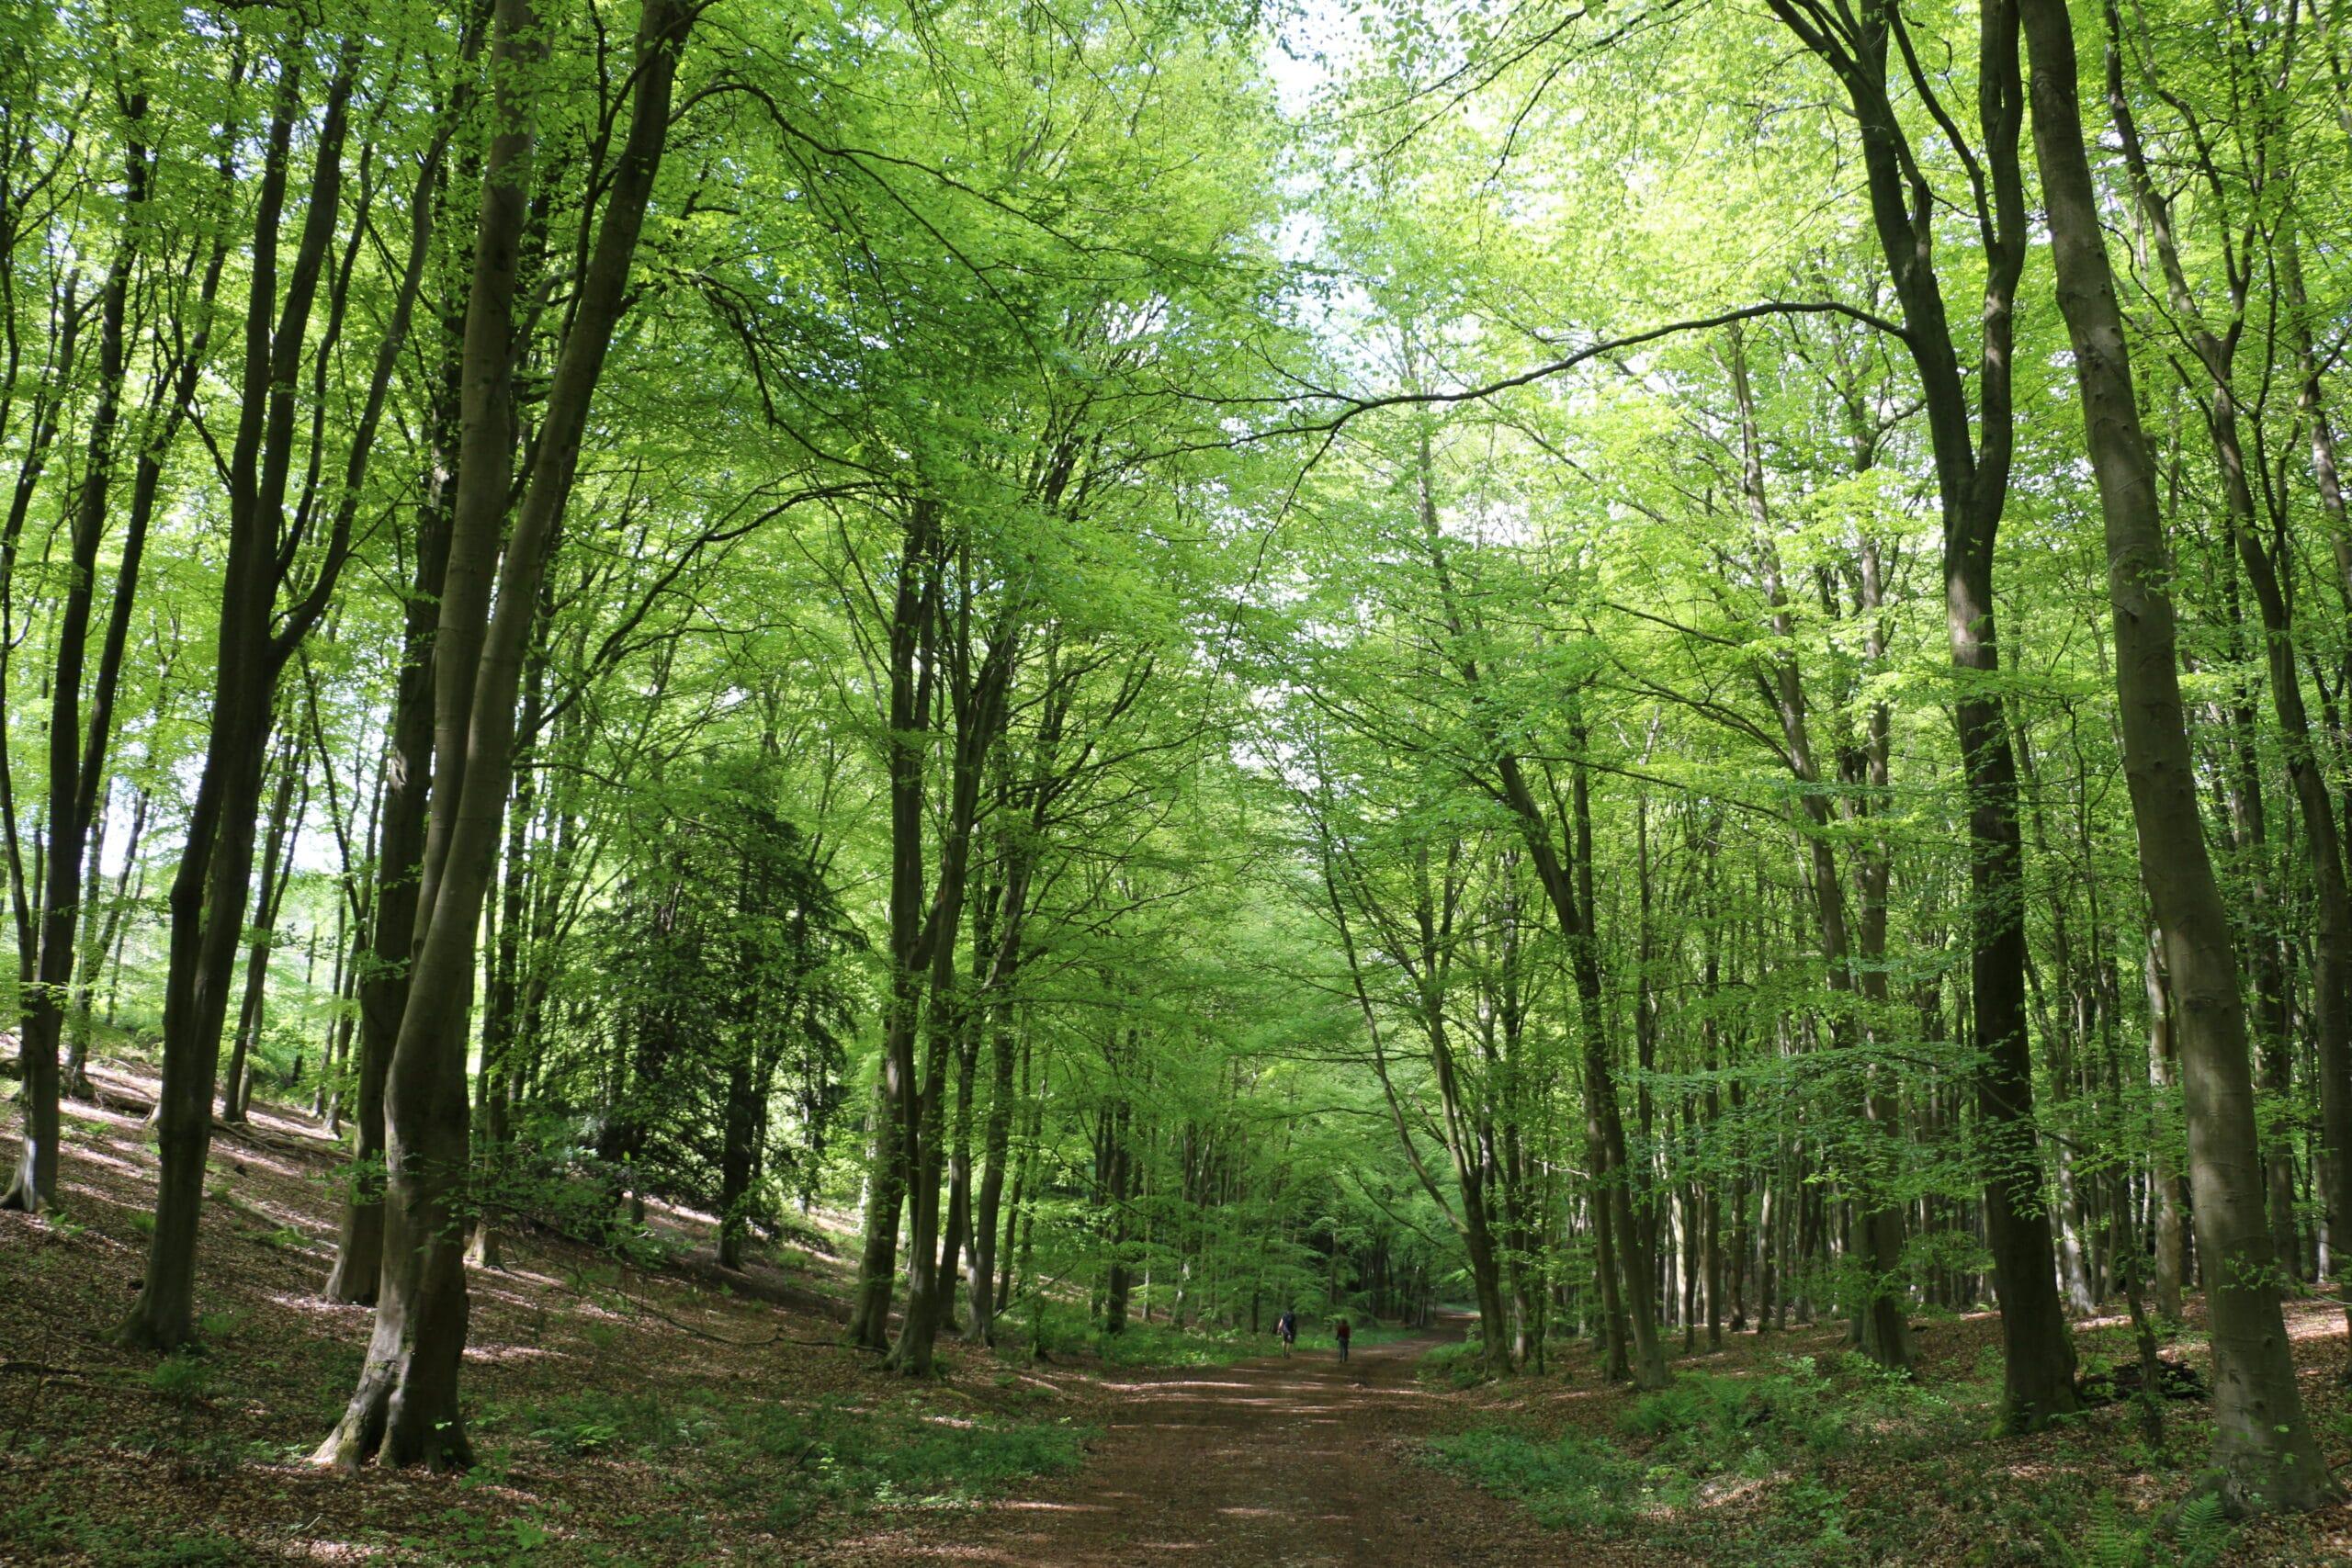 SSCG Woodland walk